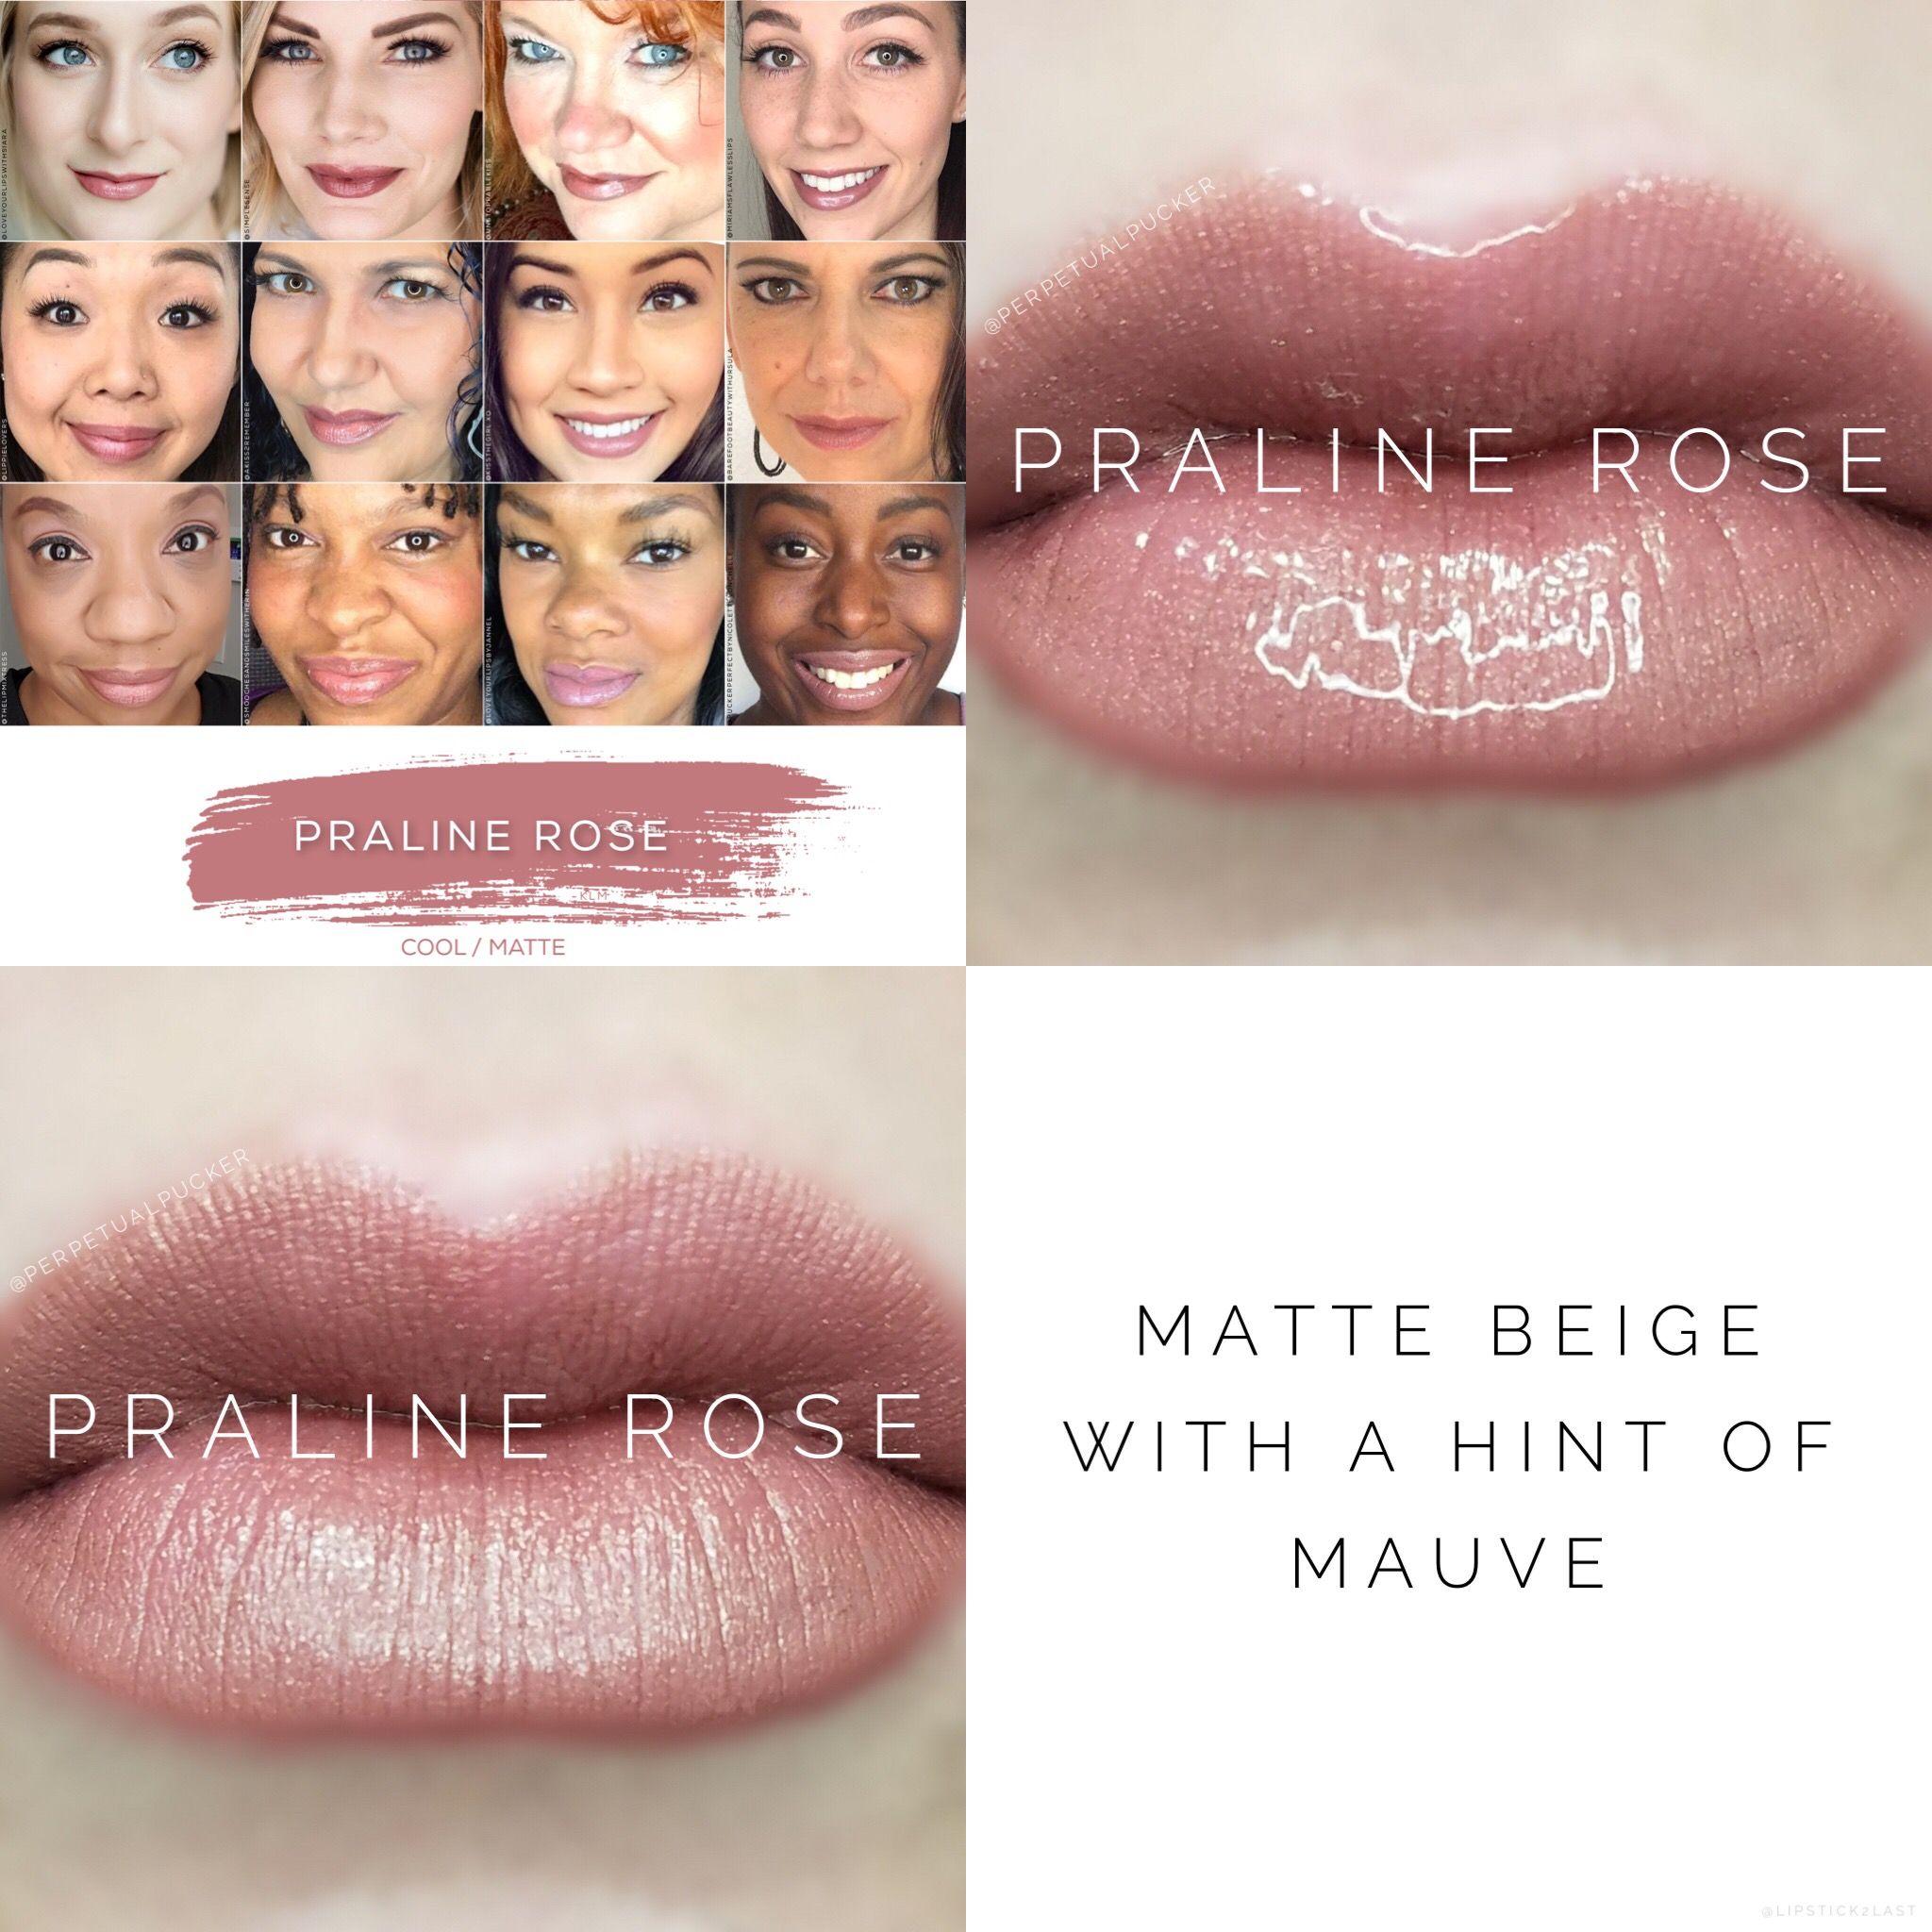 Praline Rose Lipsense Updated Face Collage Soft Brown Lipstick